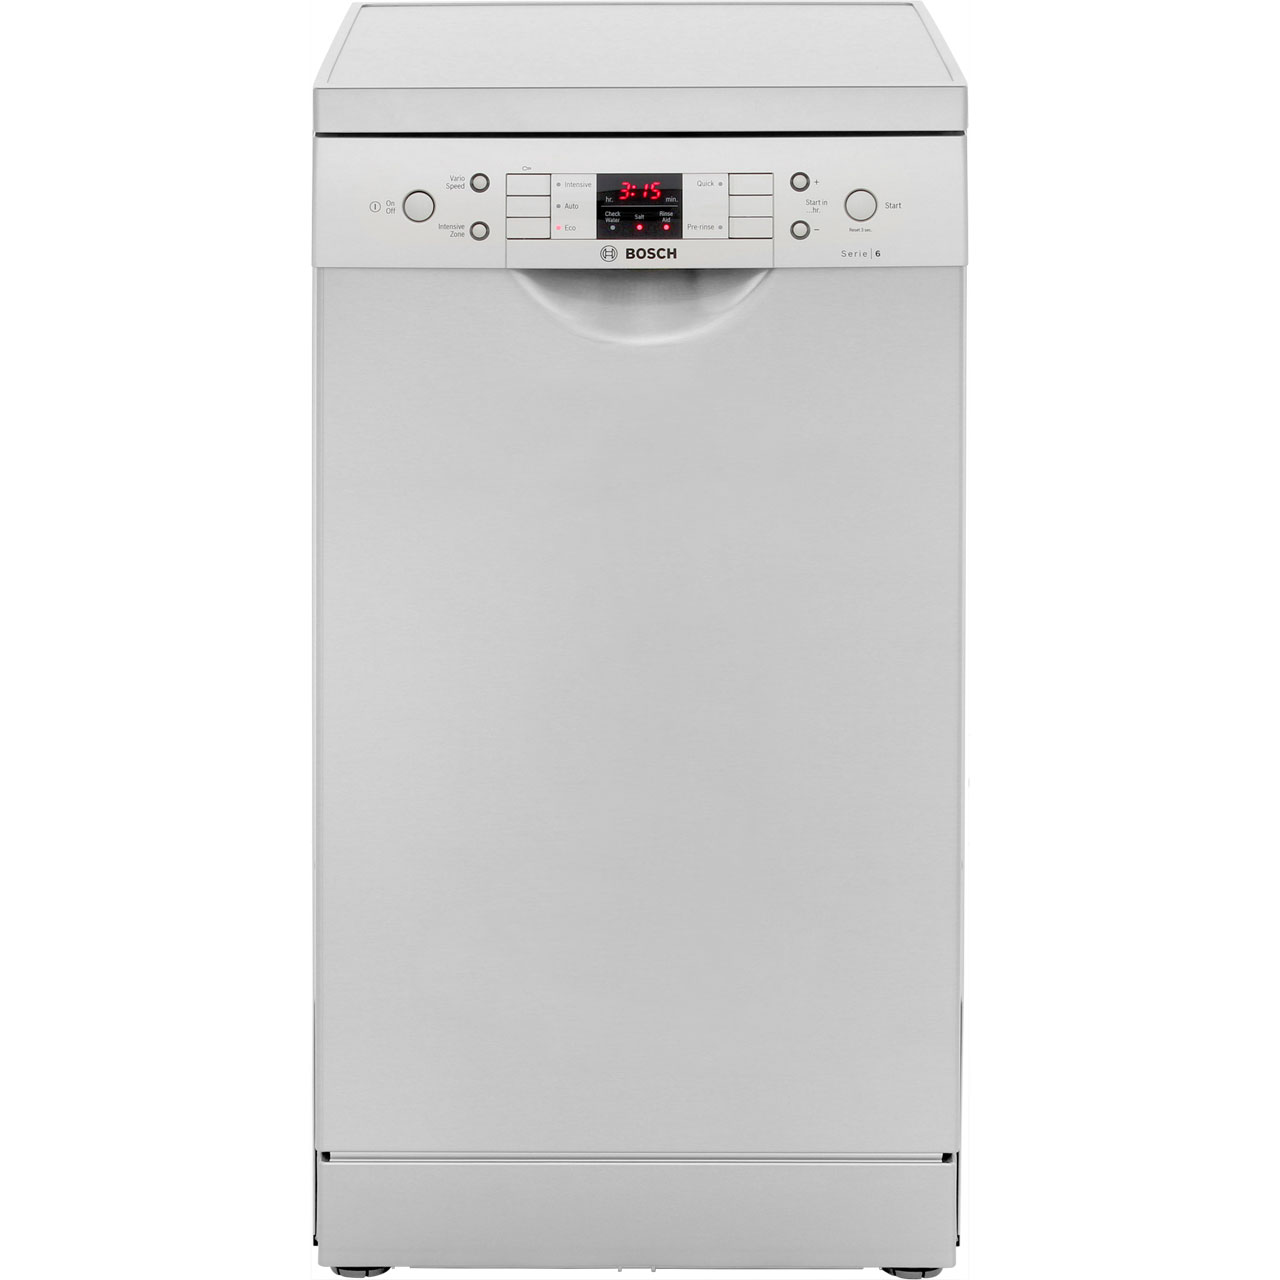 Bosch Serie 6 SPS53M08GB Free Standing Slimline Dishwasher in Silver